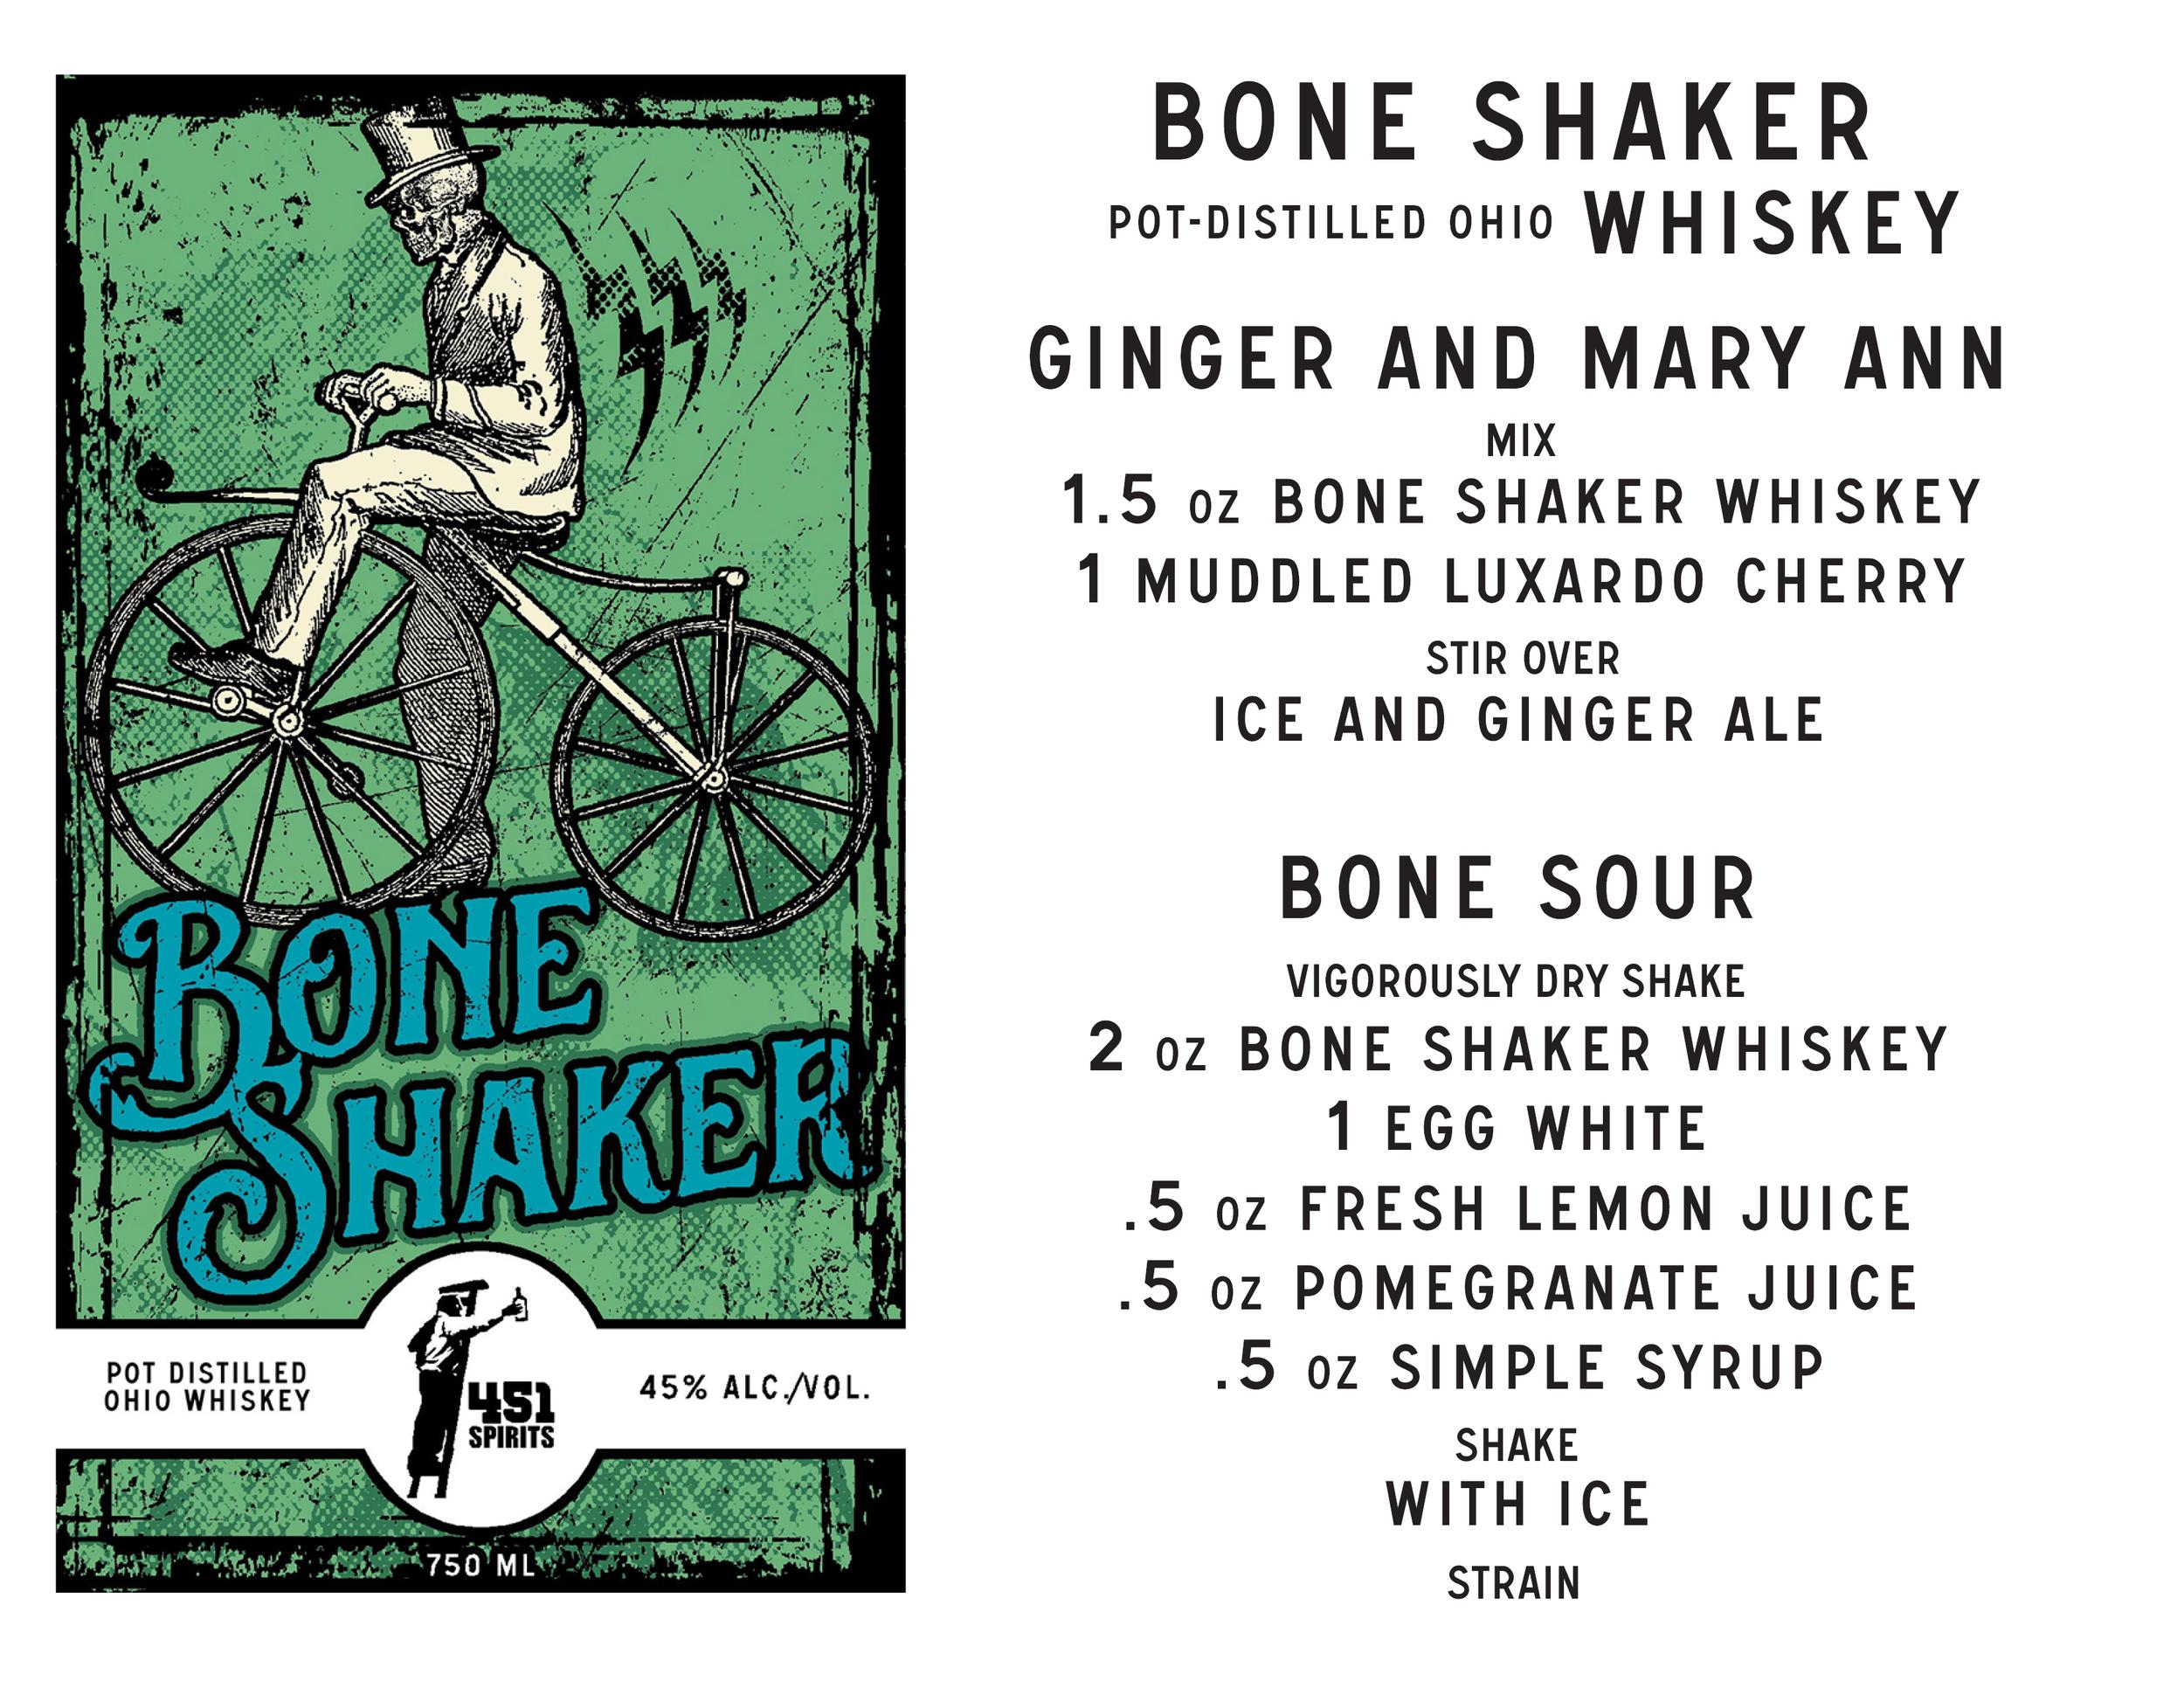 bone_shaker_whiskey_recipes.png